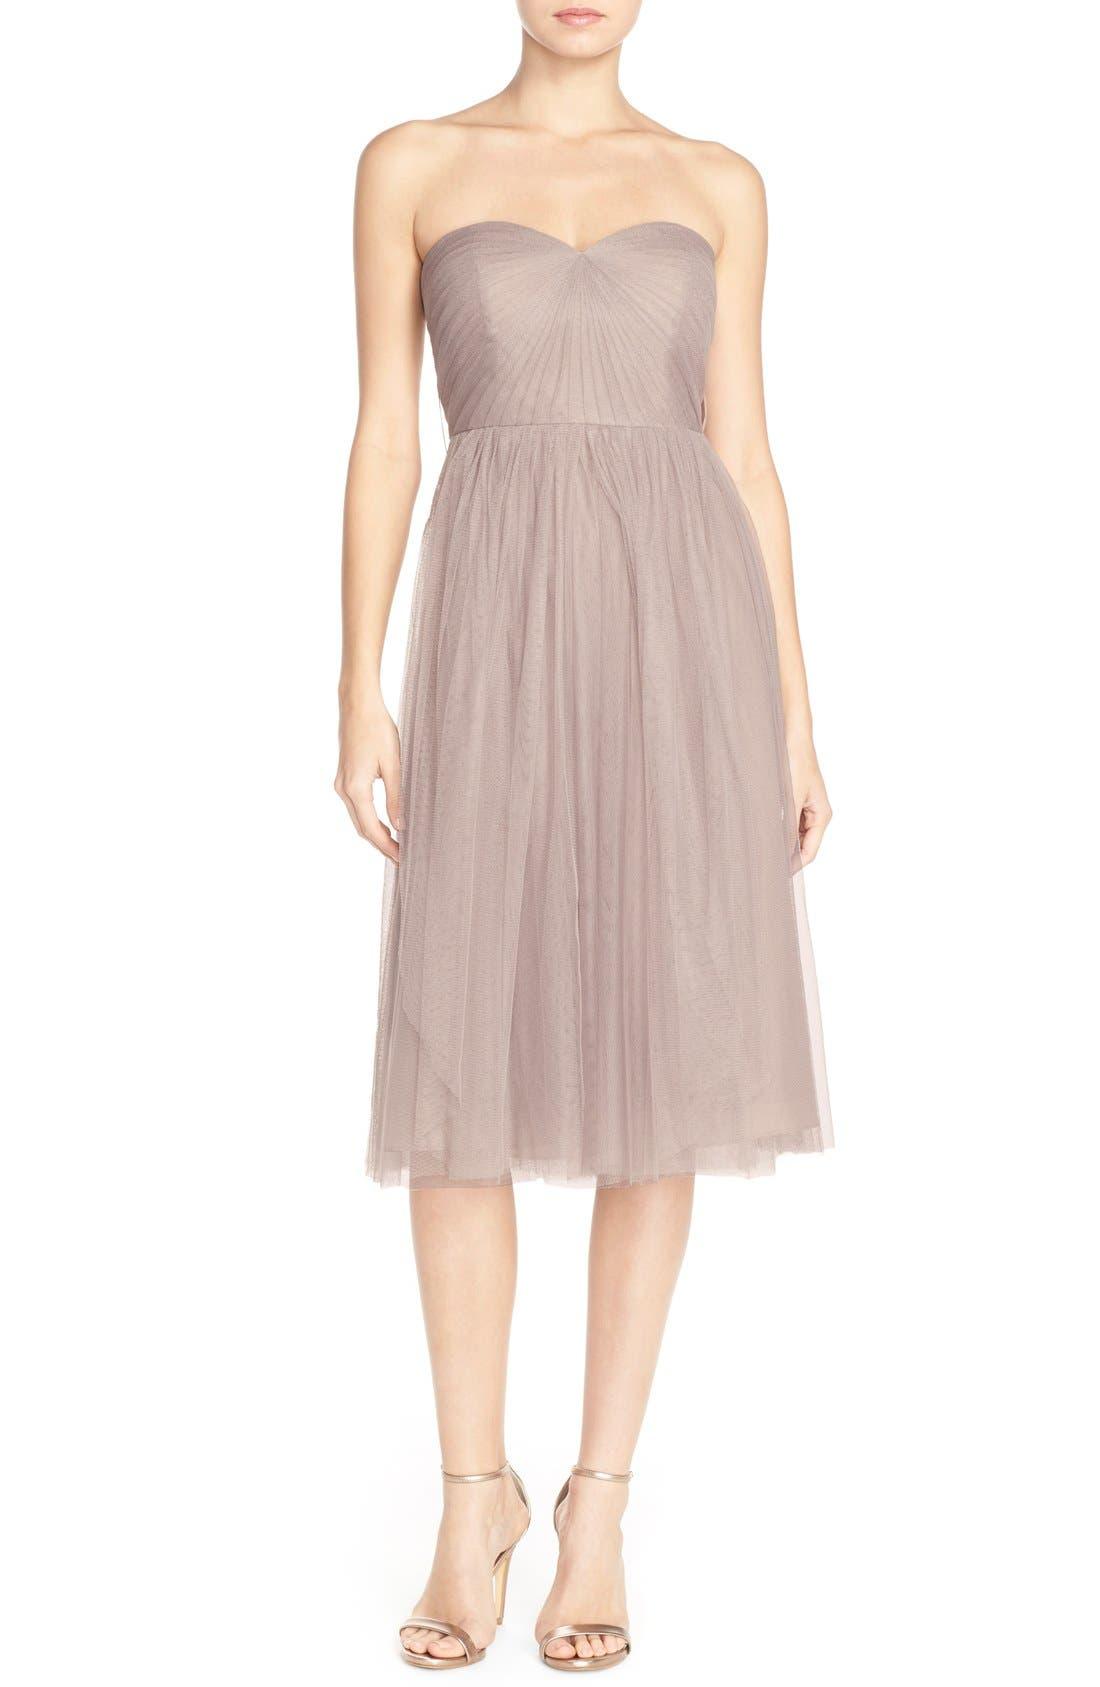 Main Image - Jenny Yoo 'Maia' Convertible Tulle Tea Length Fit & Flare Dress